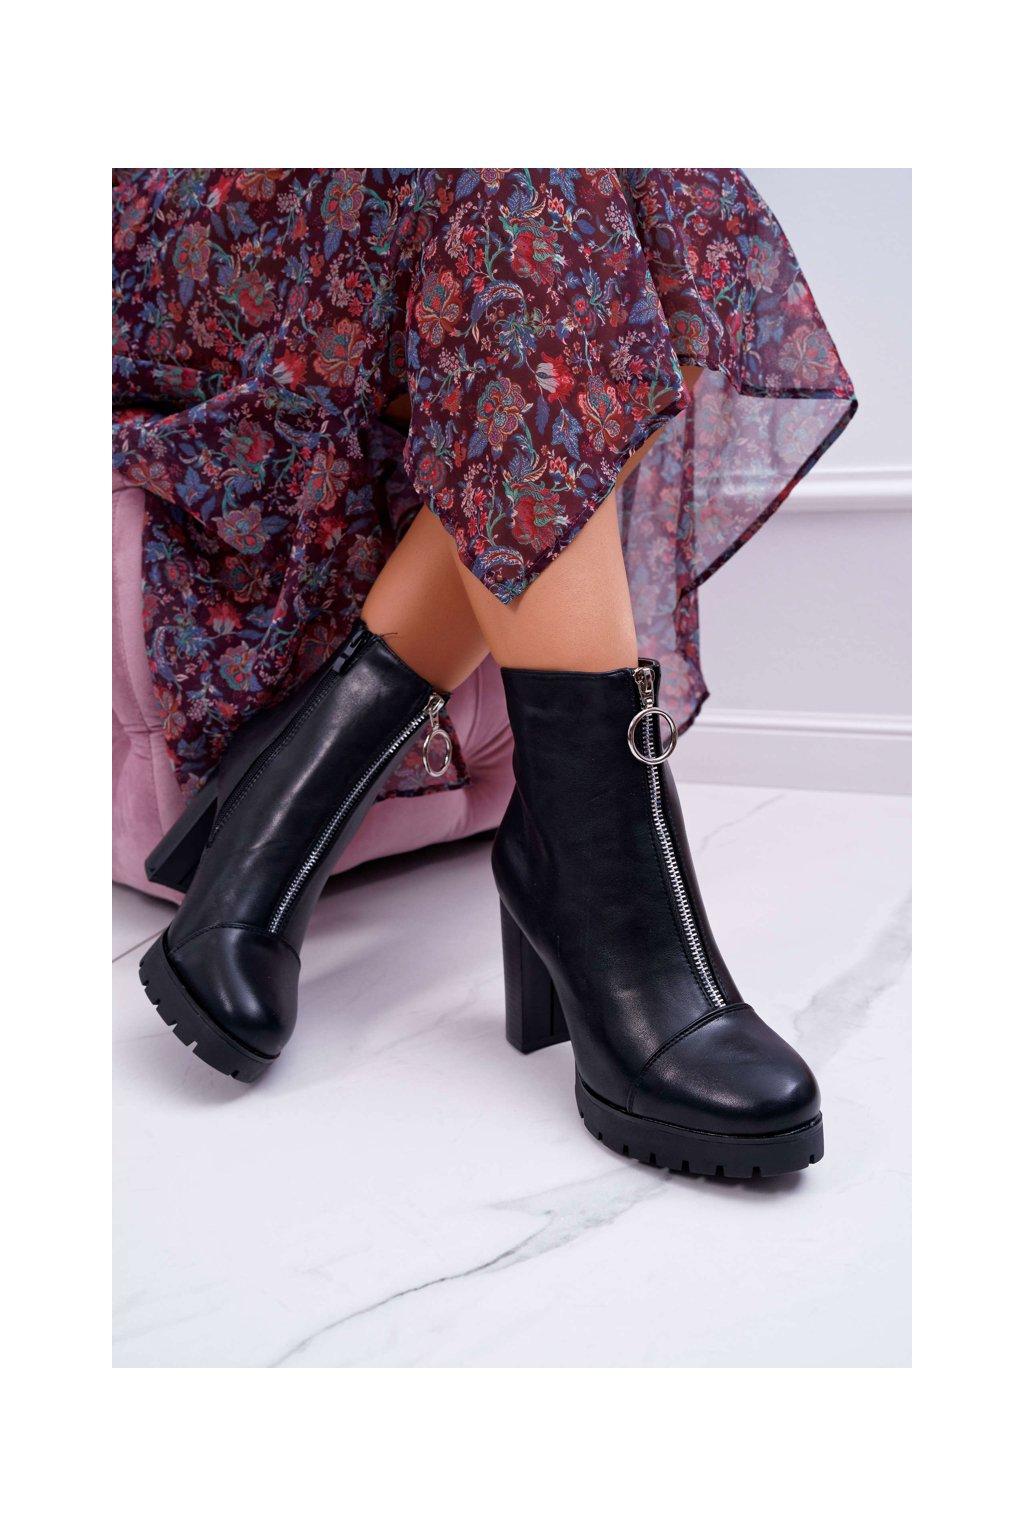 Dámske členkové topánky na podpätku s ozdobným zipsom čierne Senuto